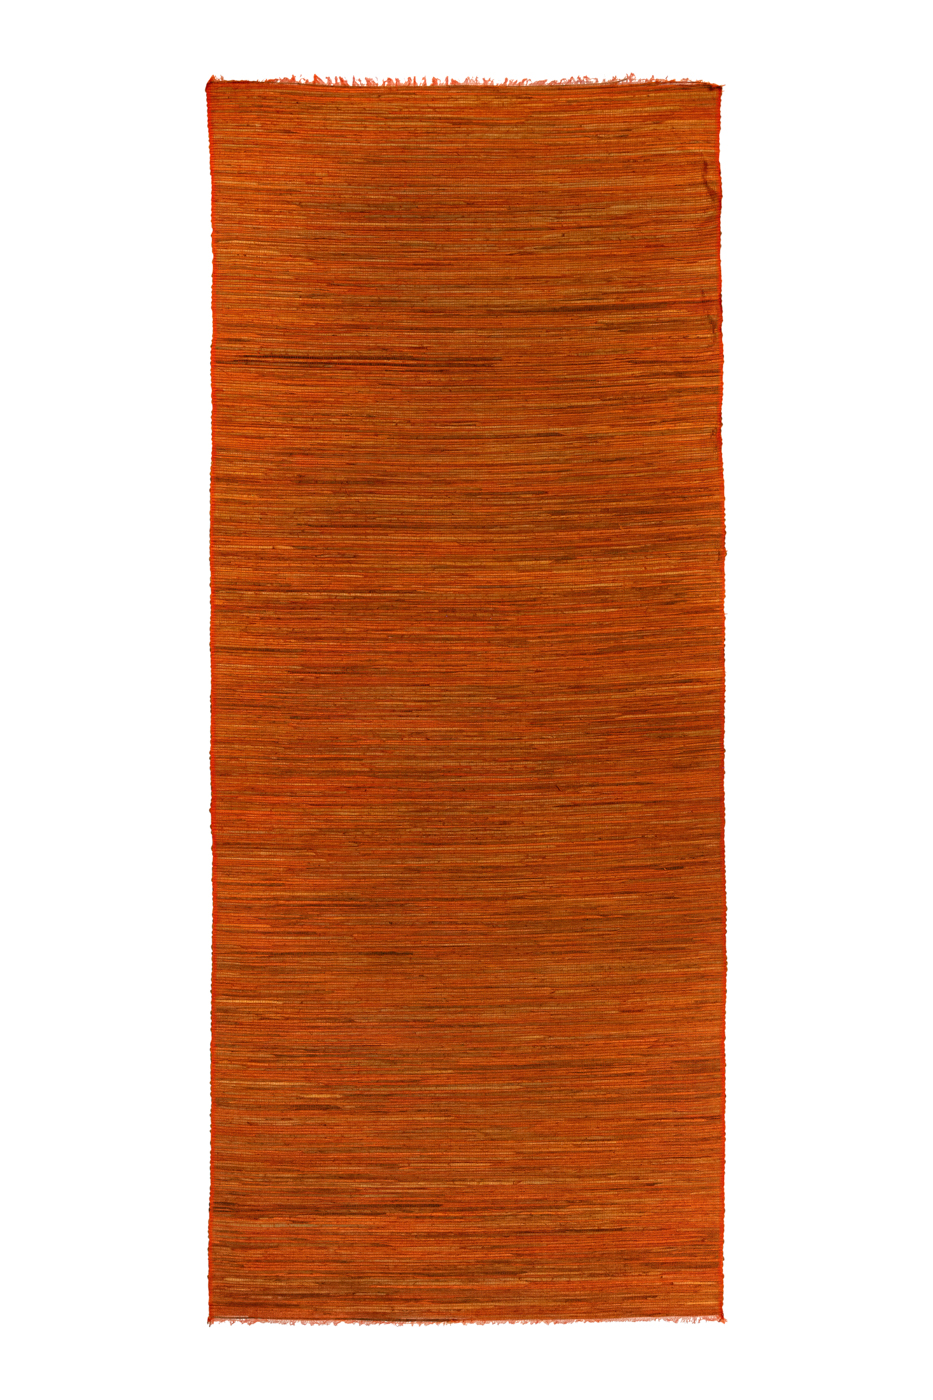 Orange bamboo mat